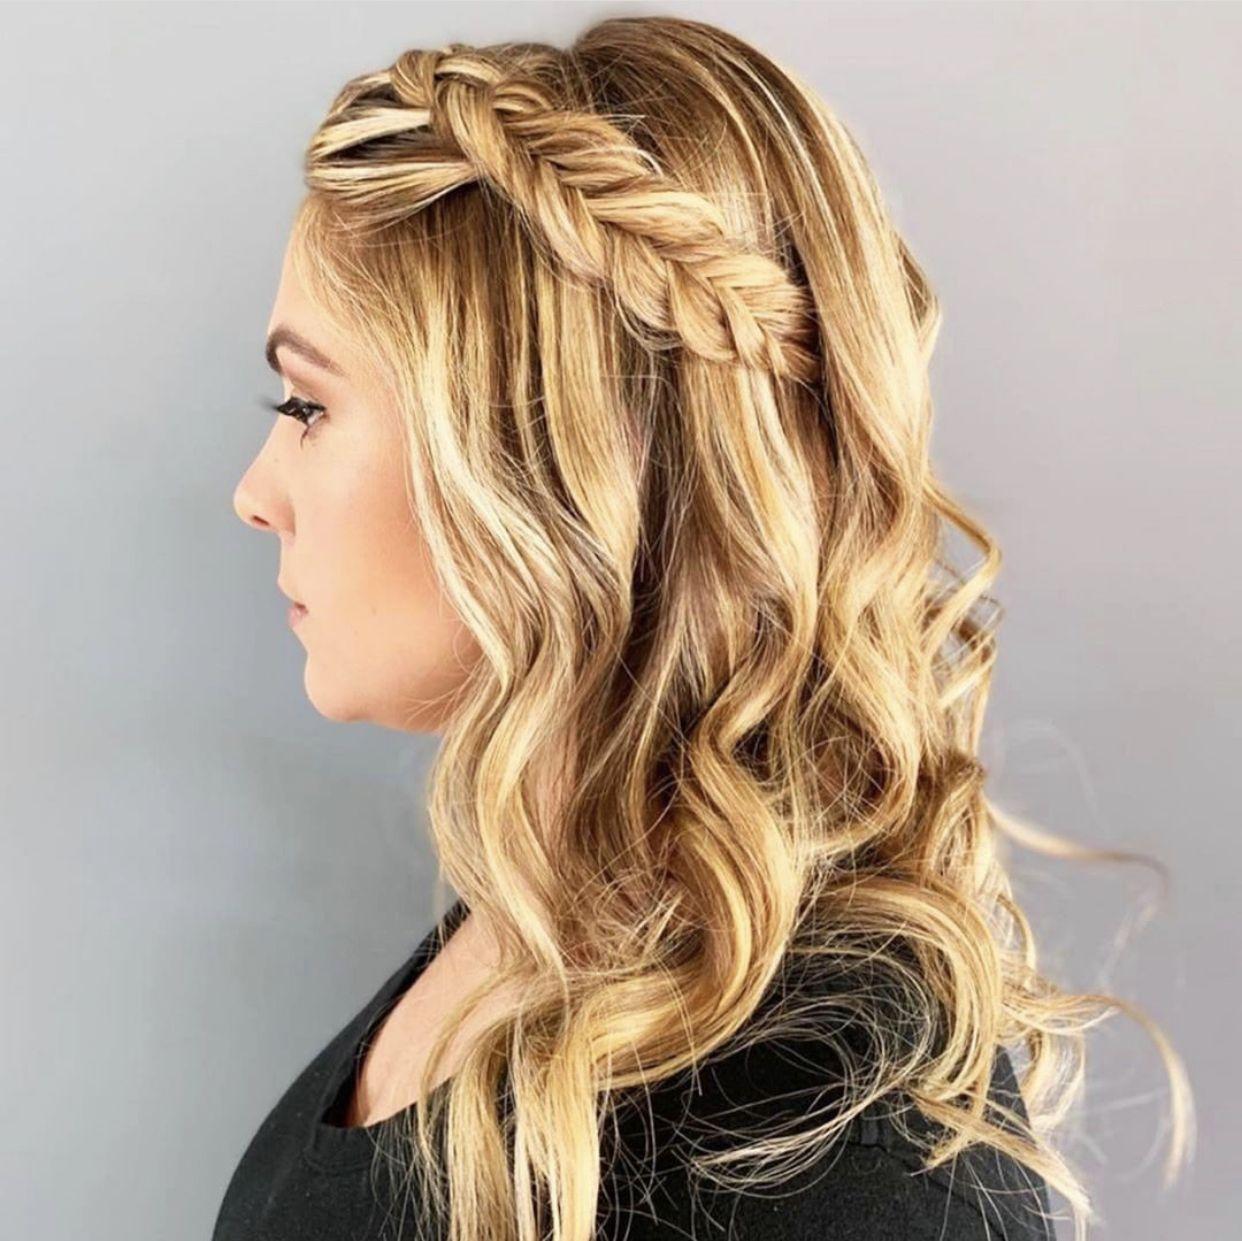 16+ Blo dry bar hairstyles ideas in 2021